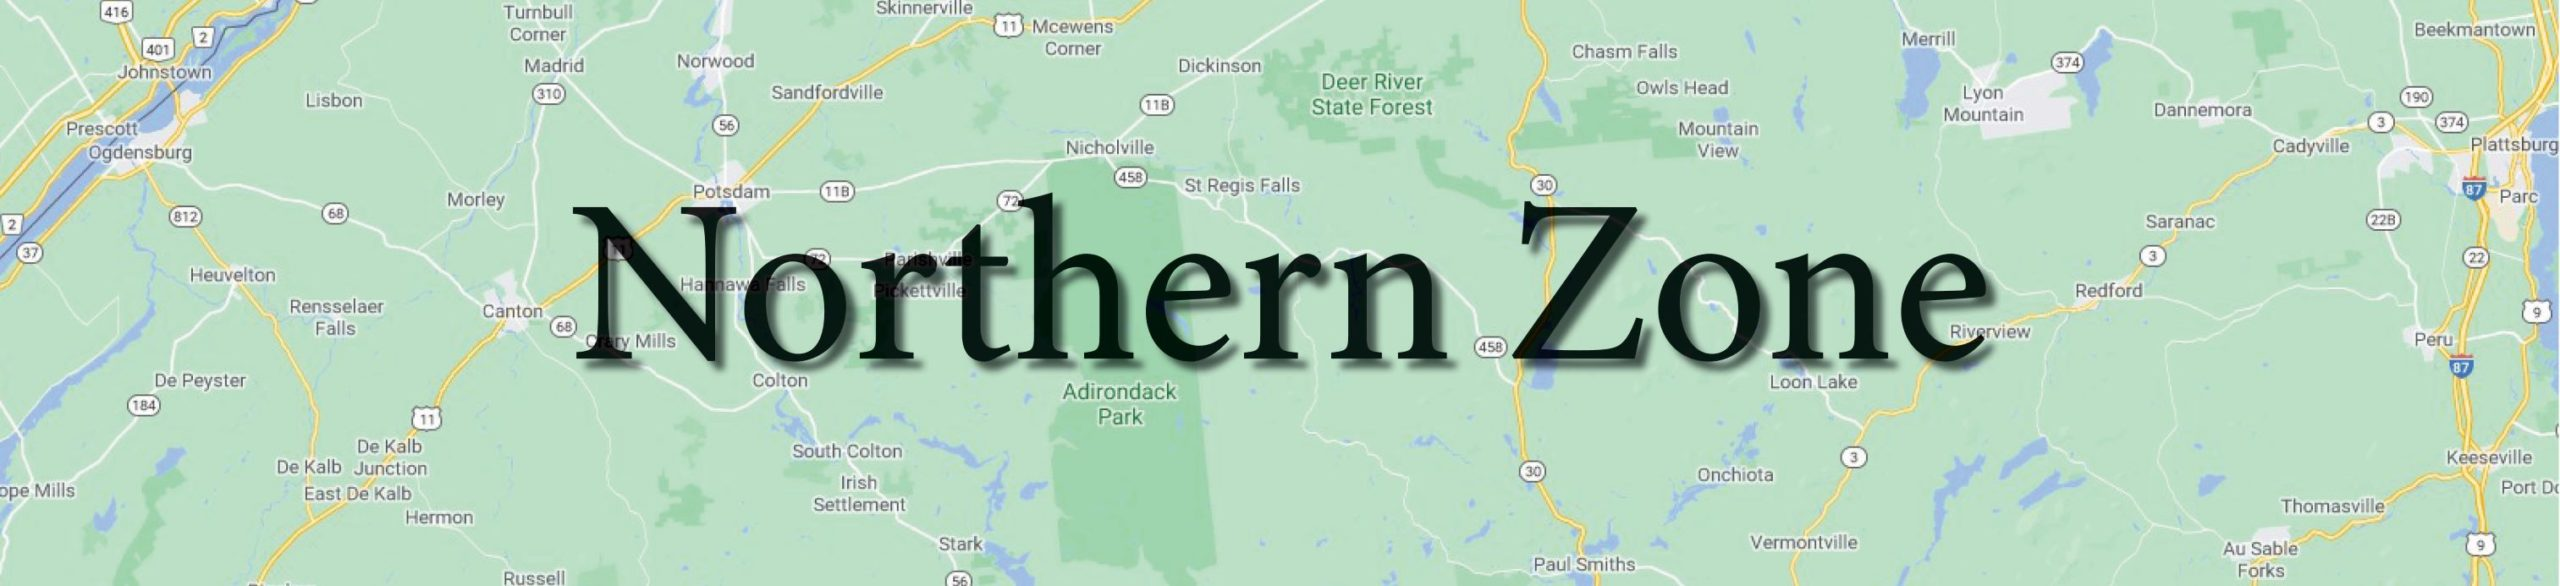 1920x440px Northern Zone